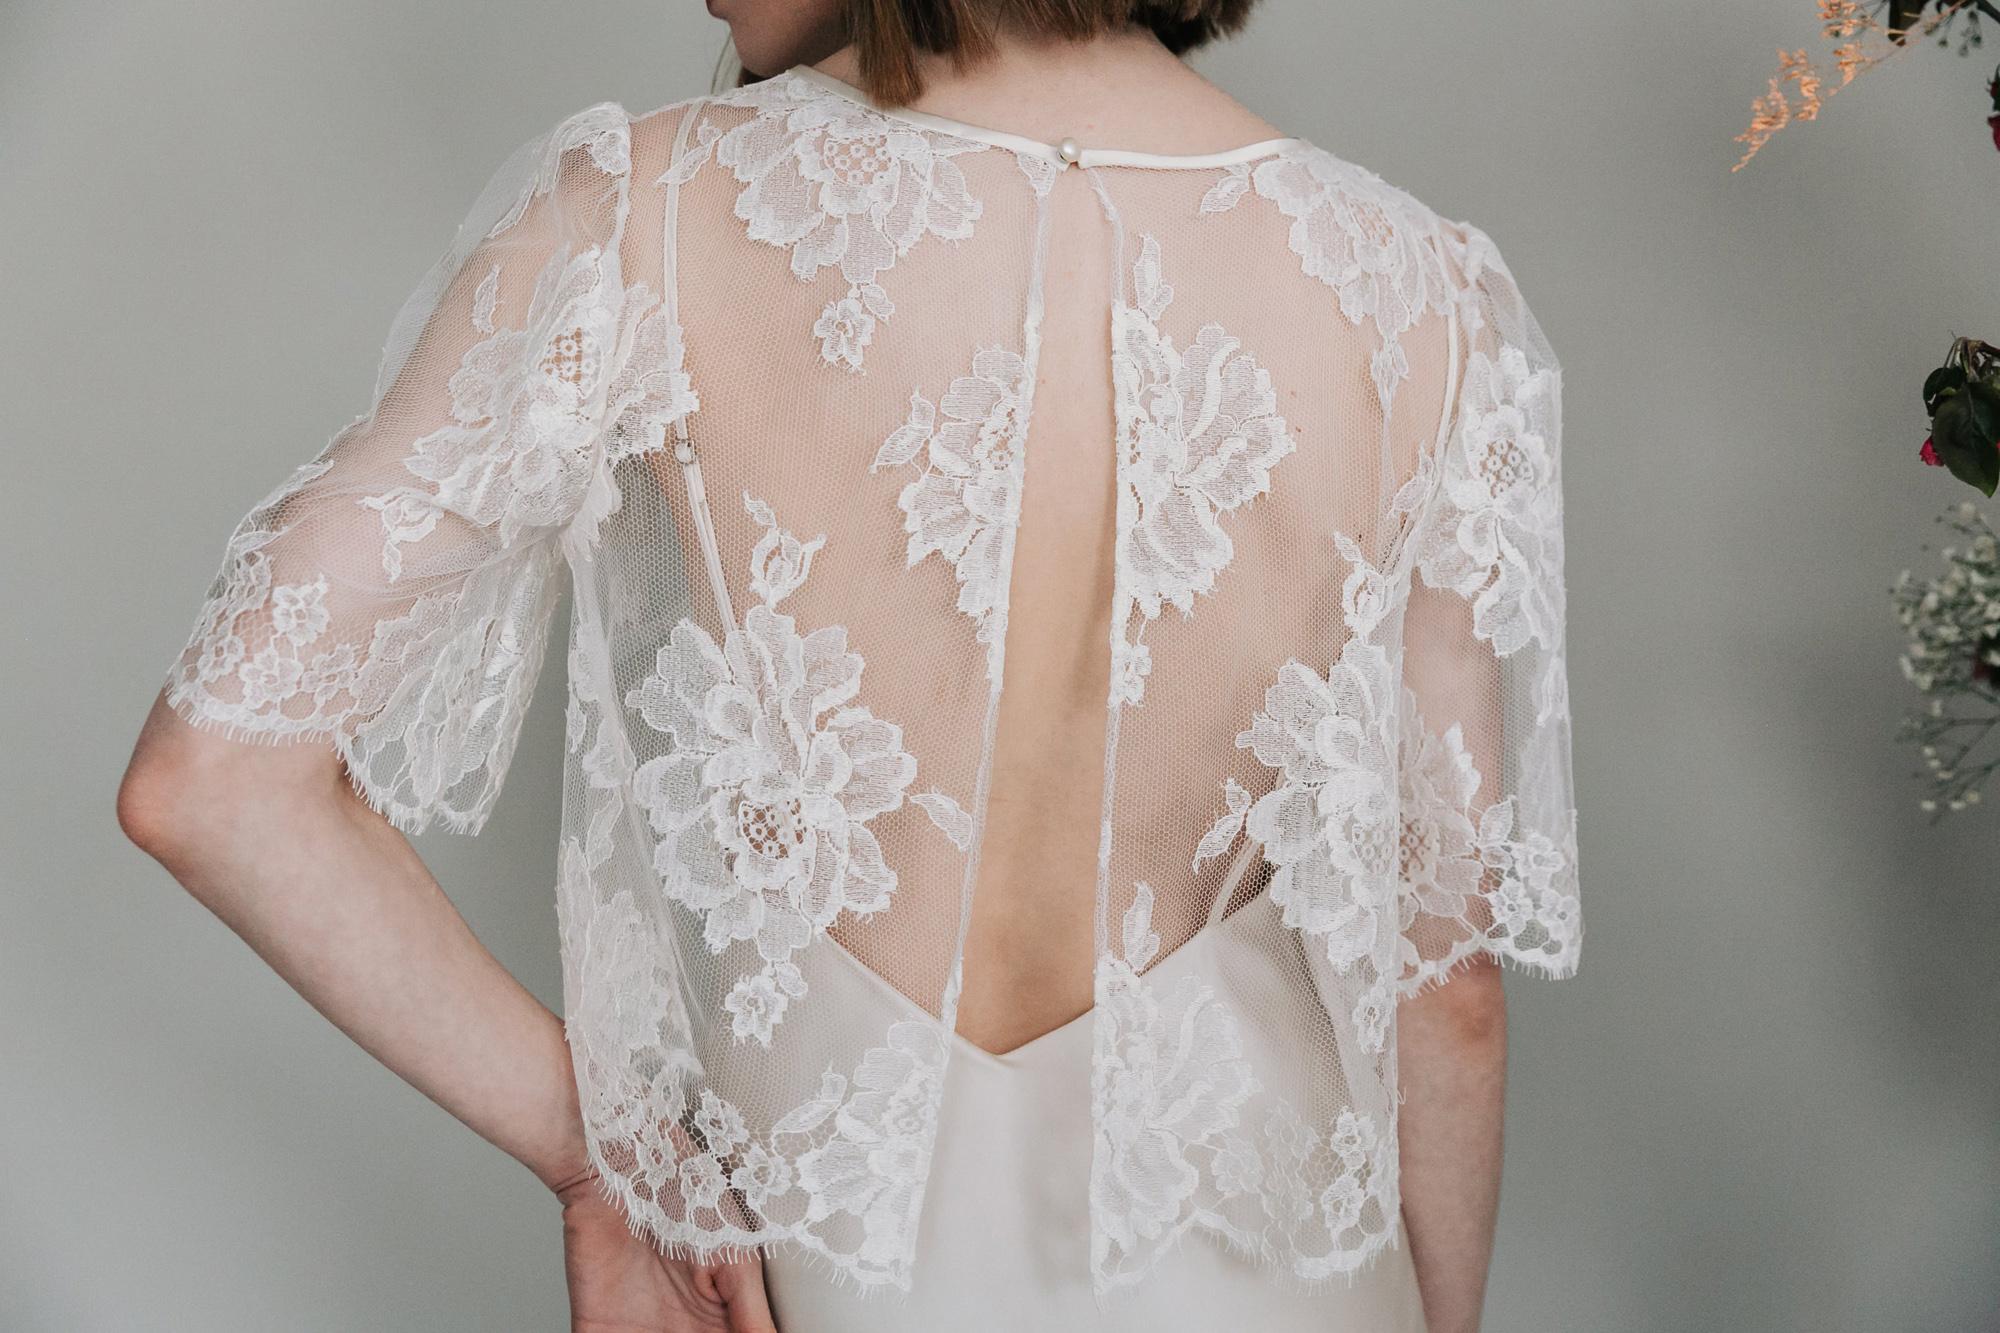 Kate-Beaumont-Sheffield-Rosa-Floral-Lace-Jacket-Camellia-Bias-Cut-Silk-Wedding-Gown-6.jpg